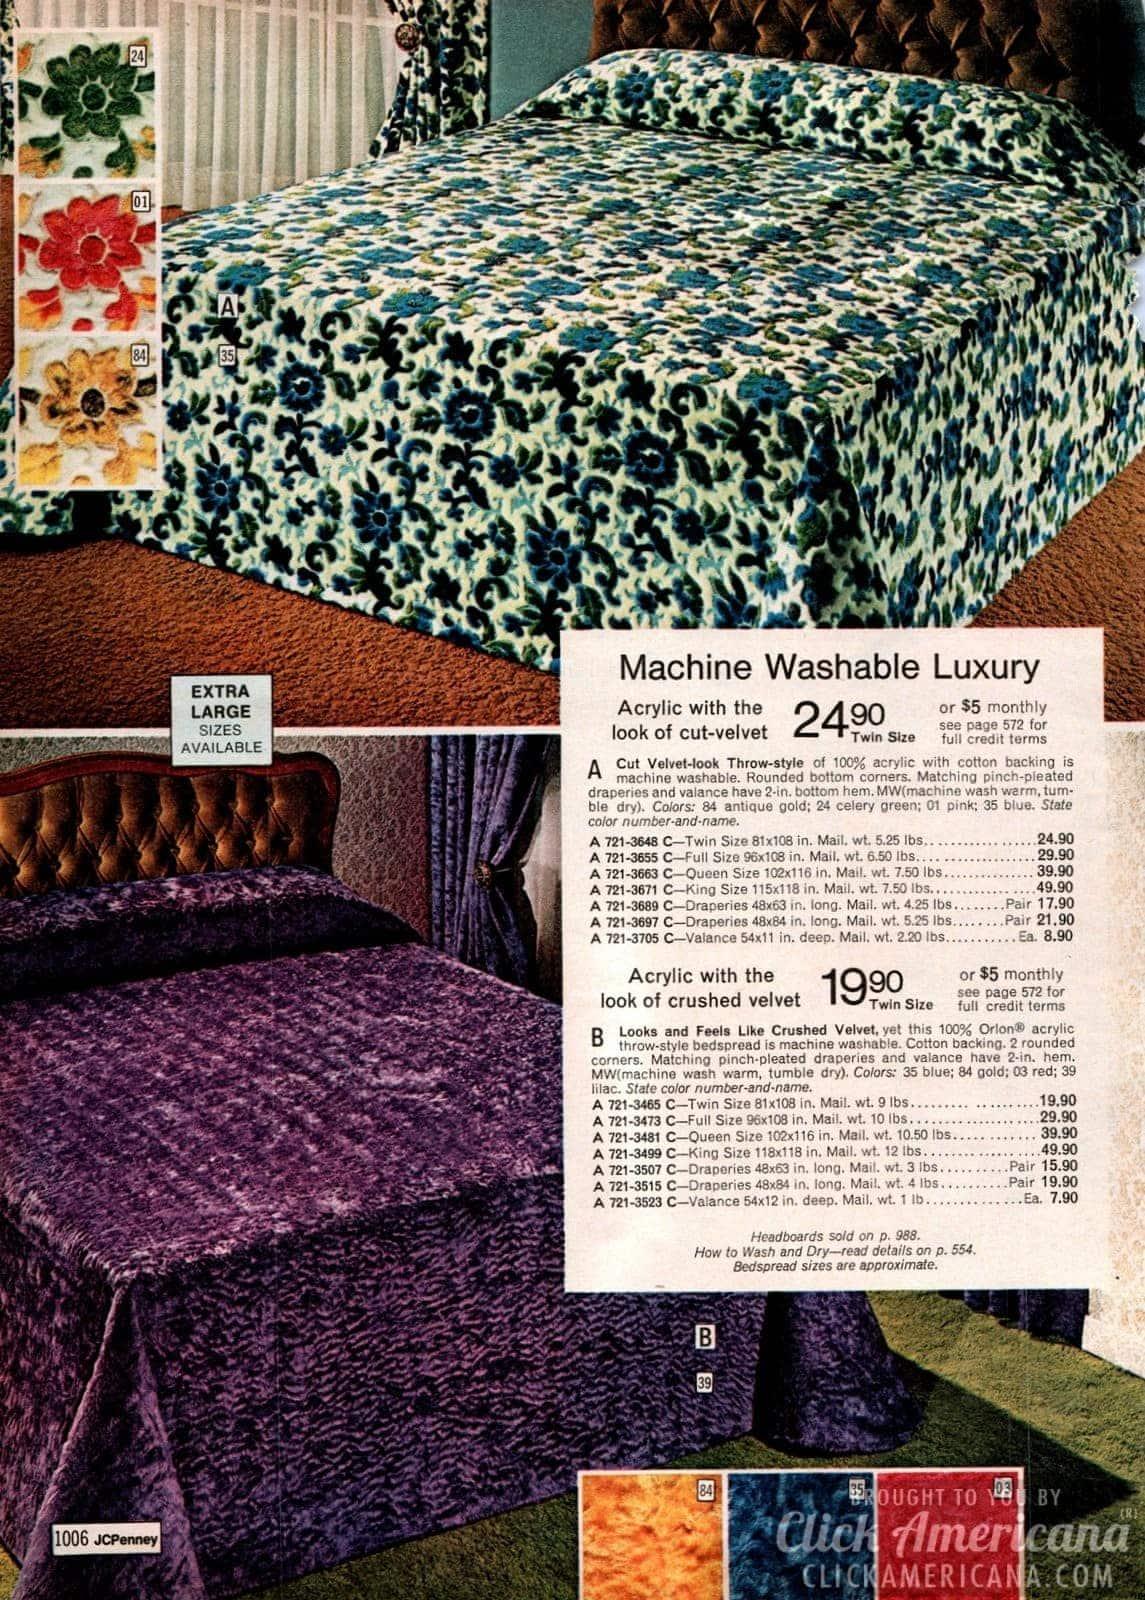 Acrylic crushed velvet bedspreads from the '70s - including cut velvet flowers